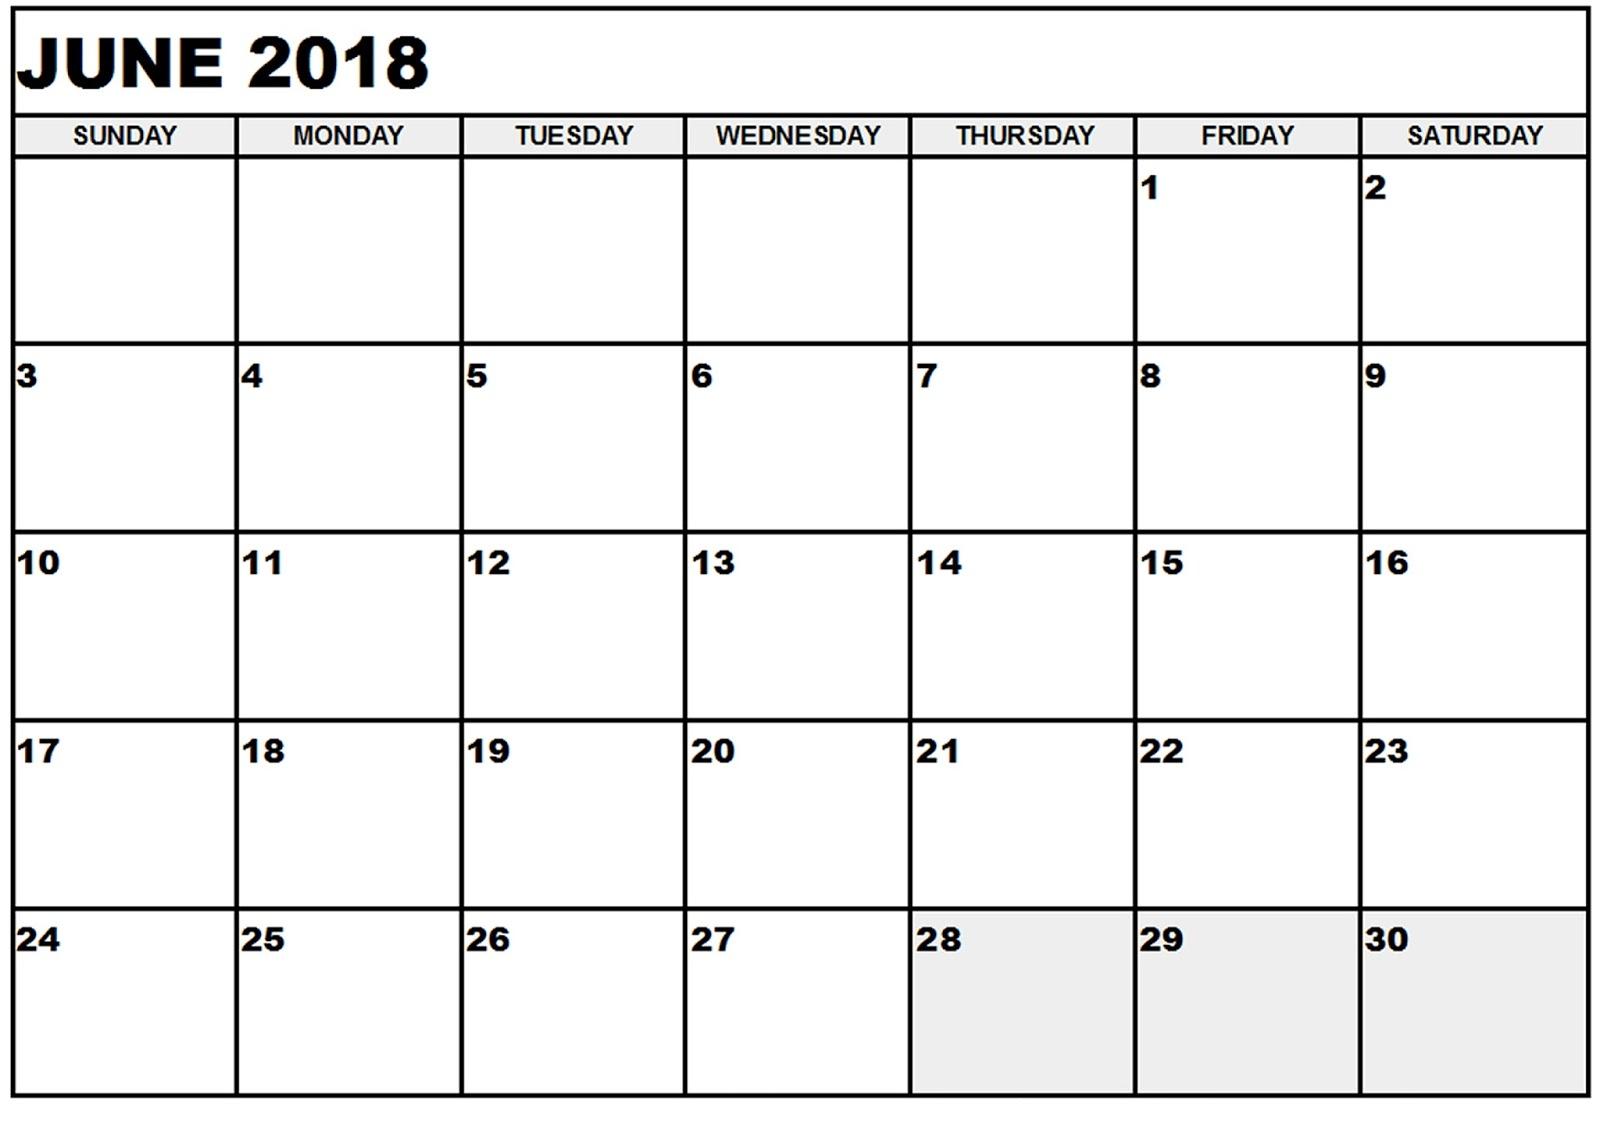 June Calendar 2018